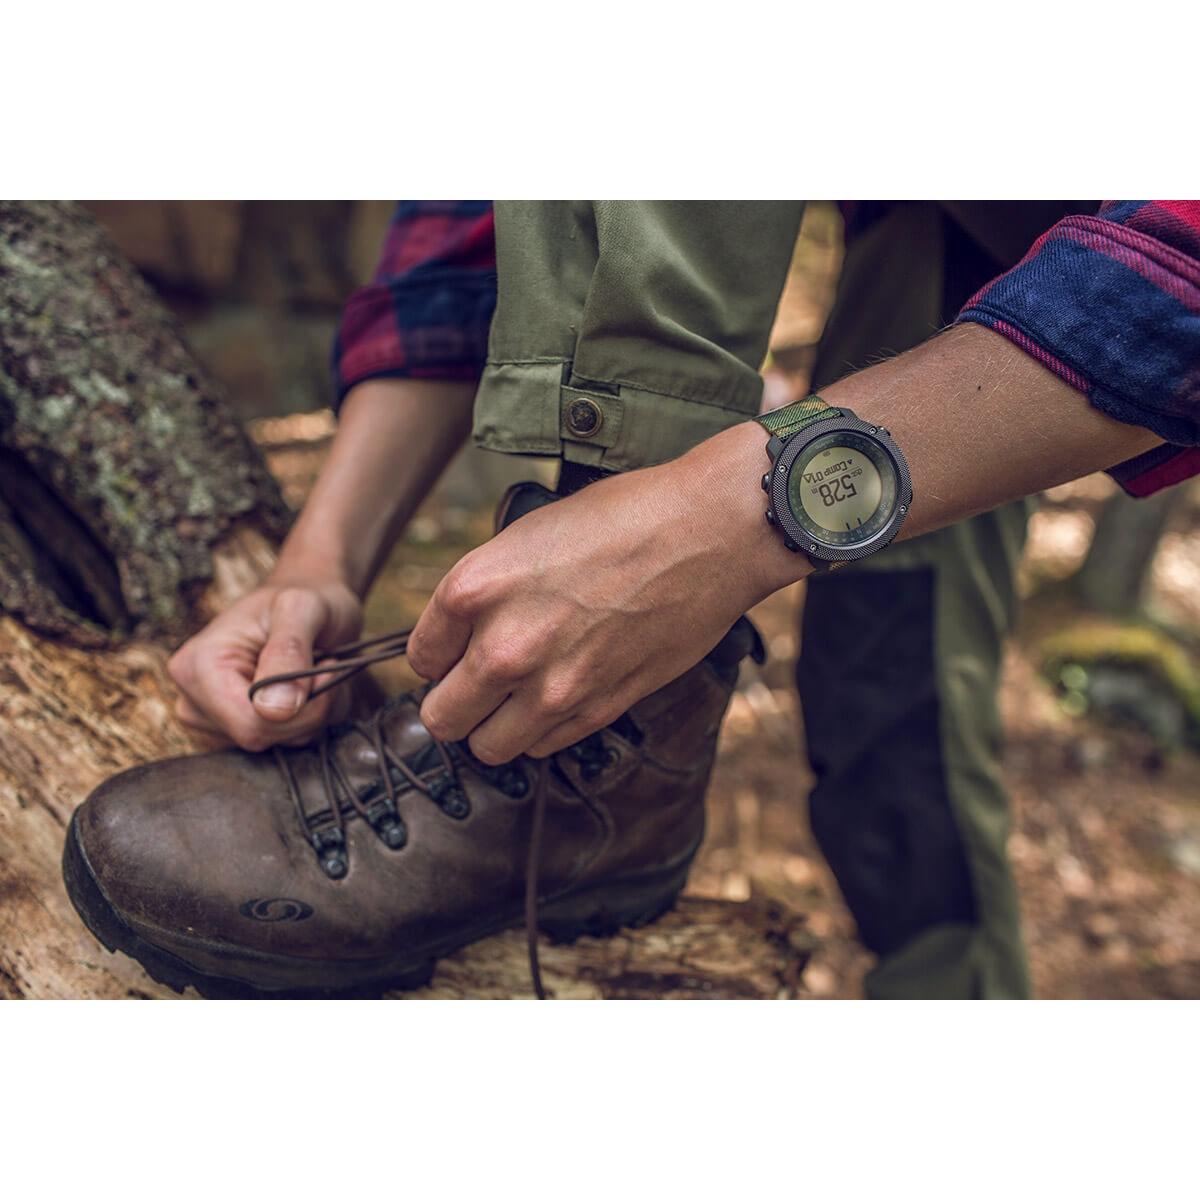 Suunto Traverse Alpha Gps Glonass Watch Woodland Black Outdoor Watches With Image Of